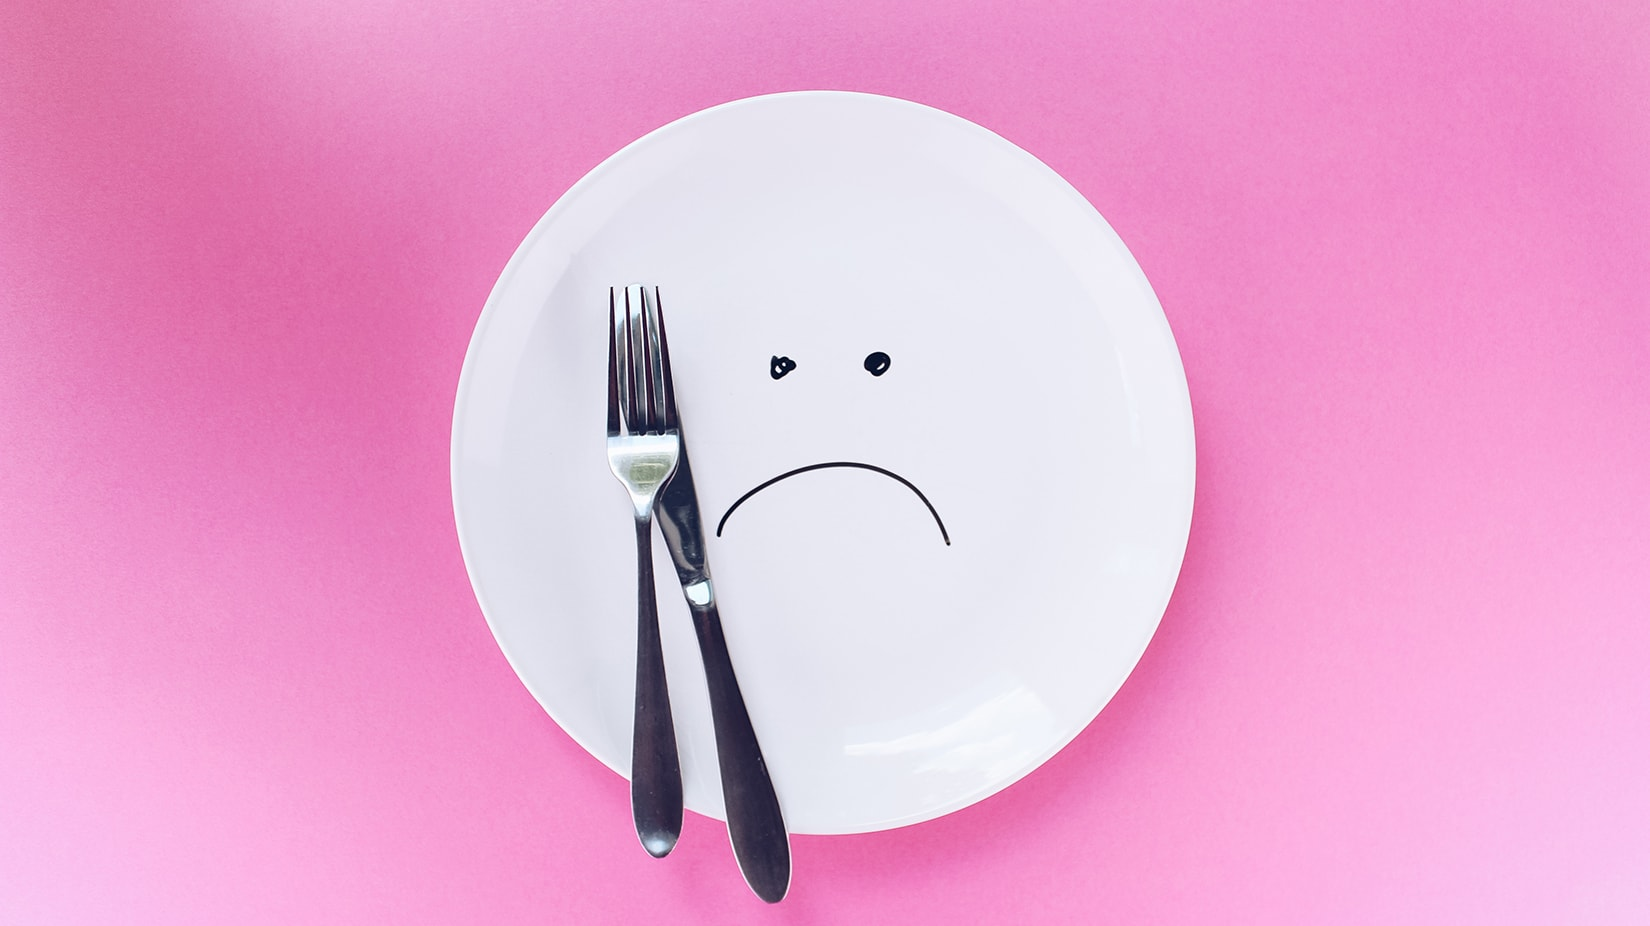 Cura Disturbi Alimentari e Patologie